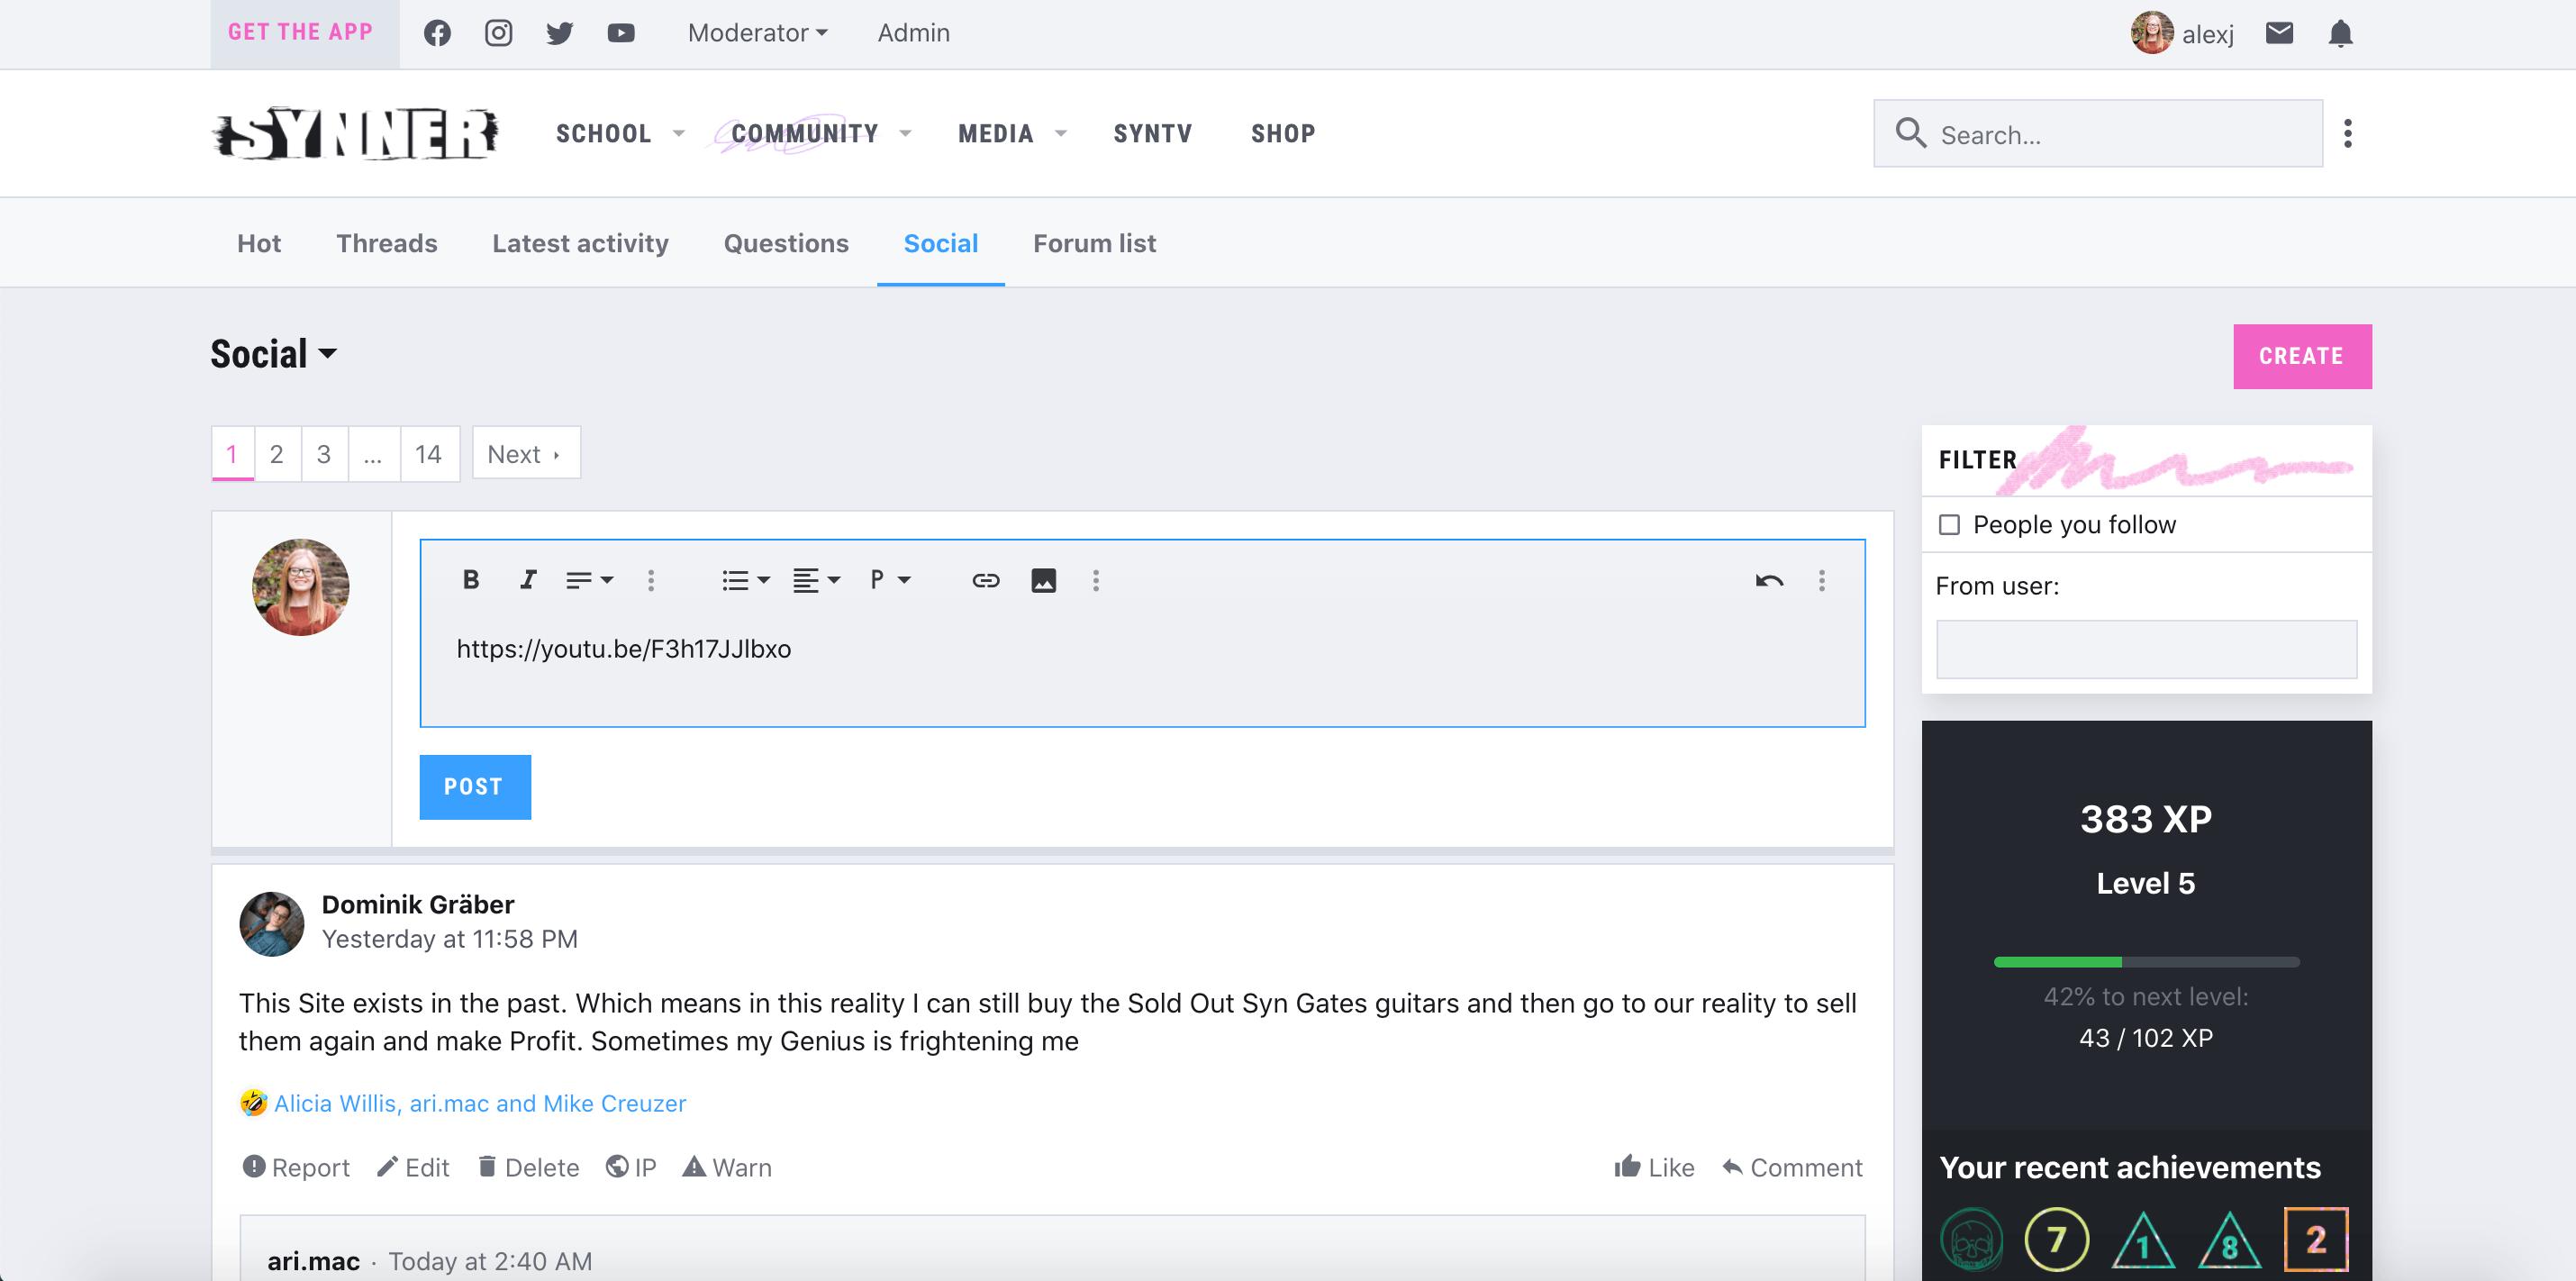 Adding media to posts